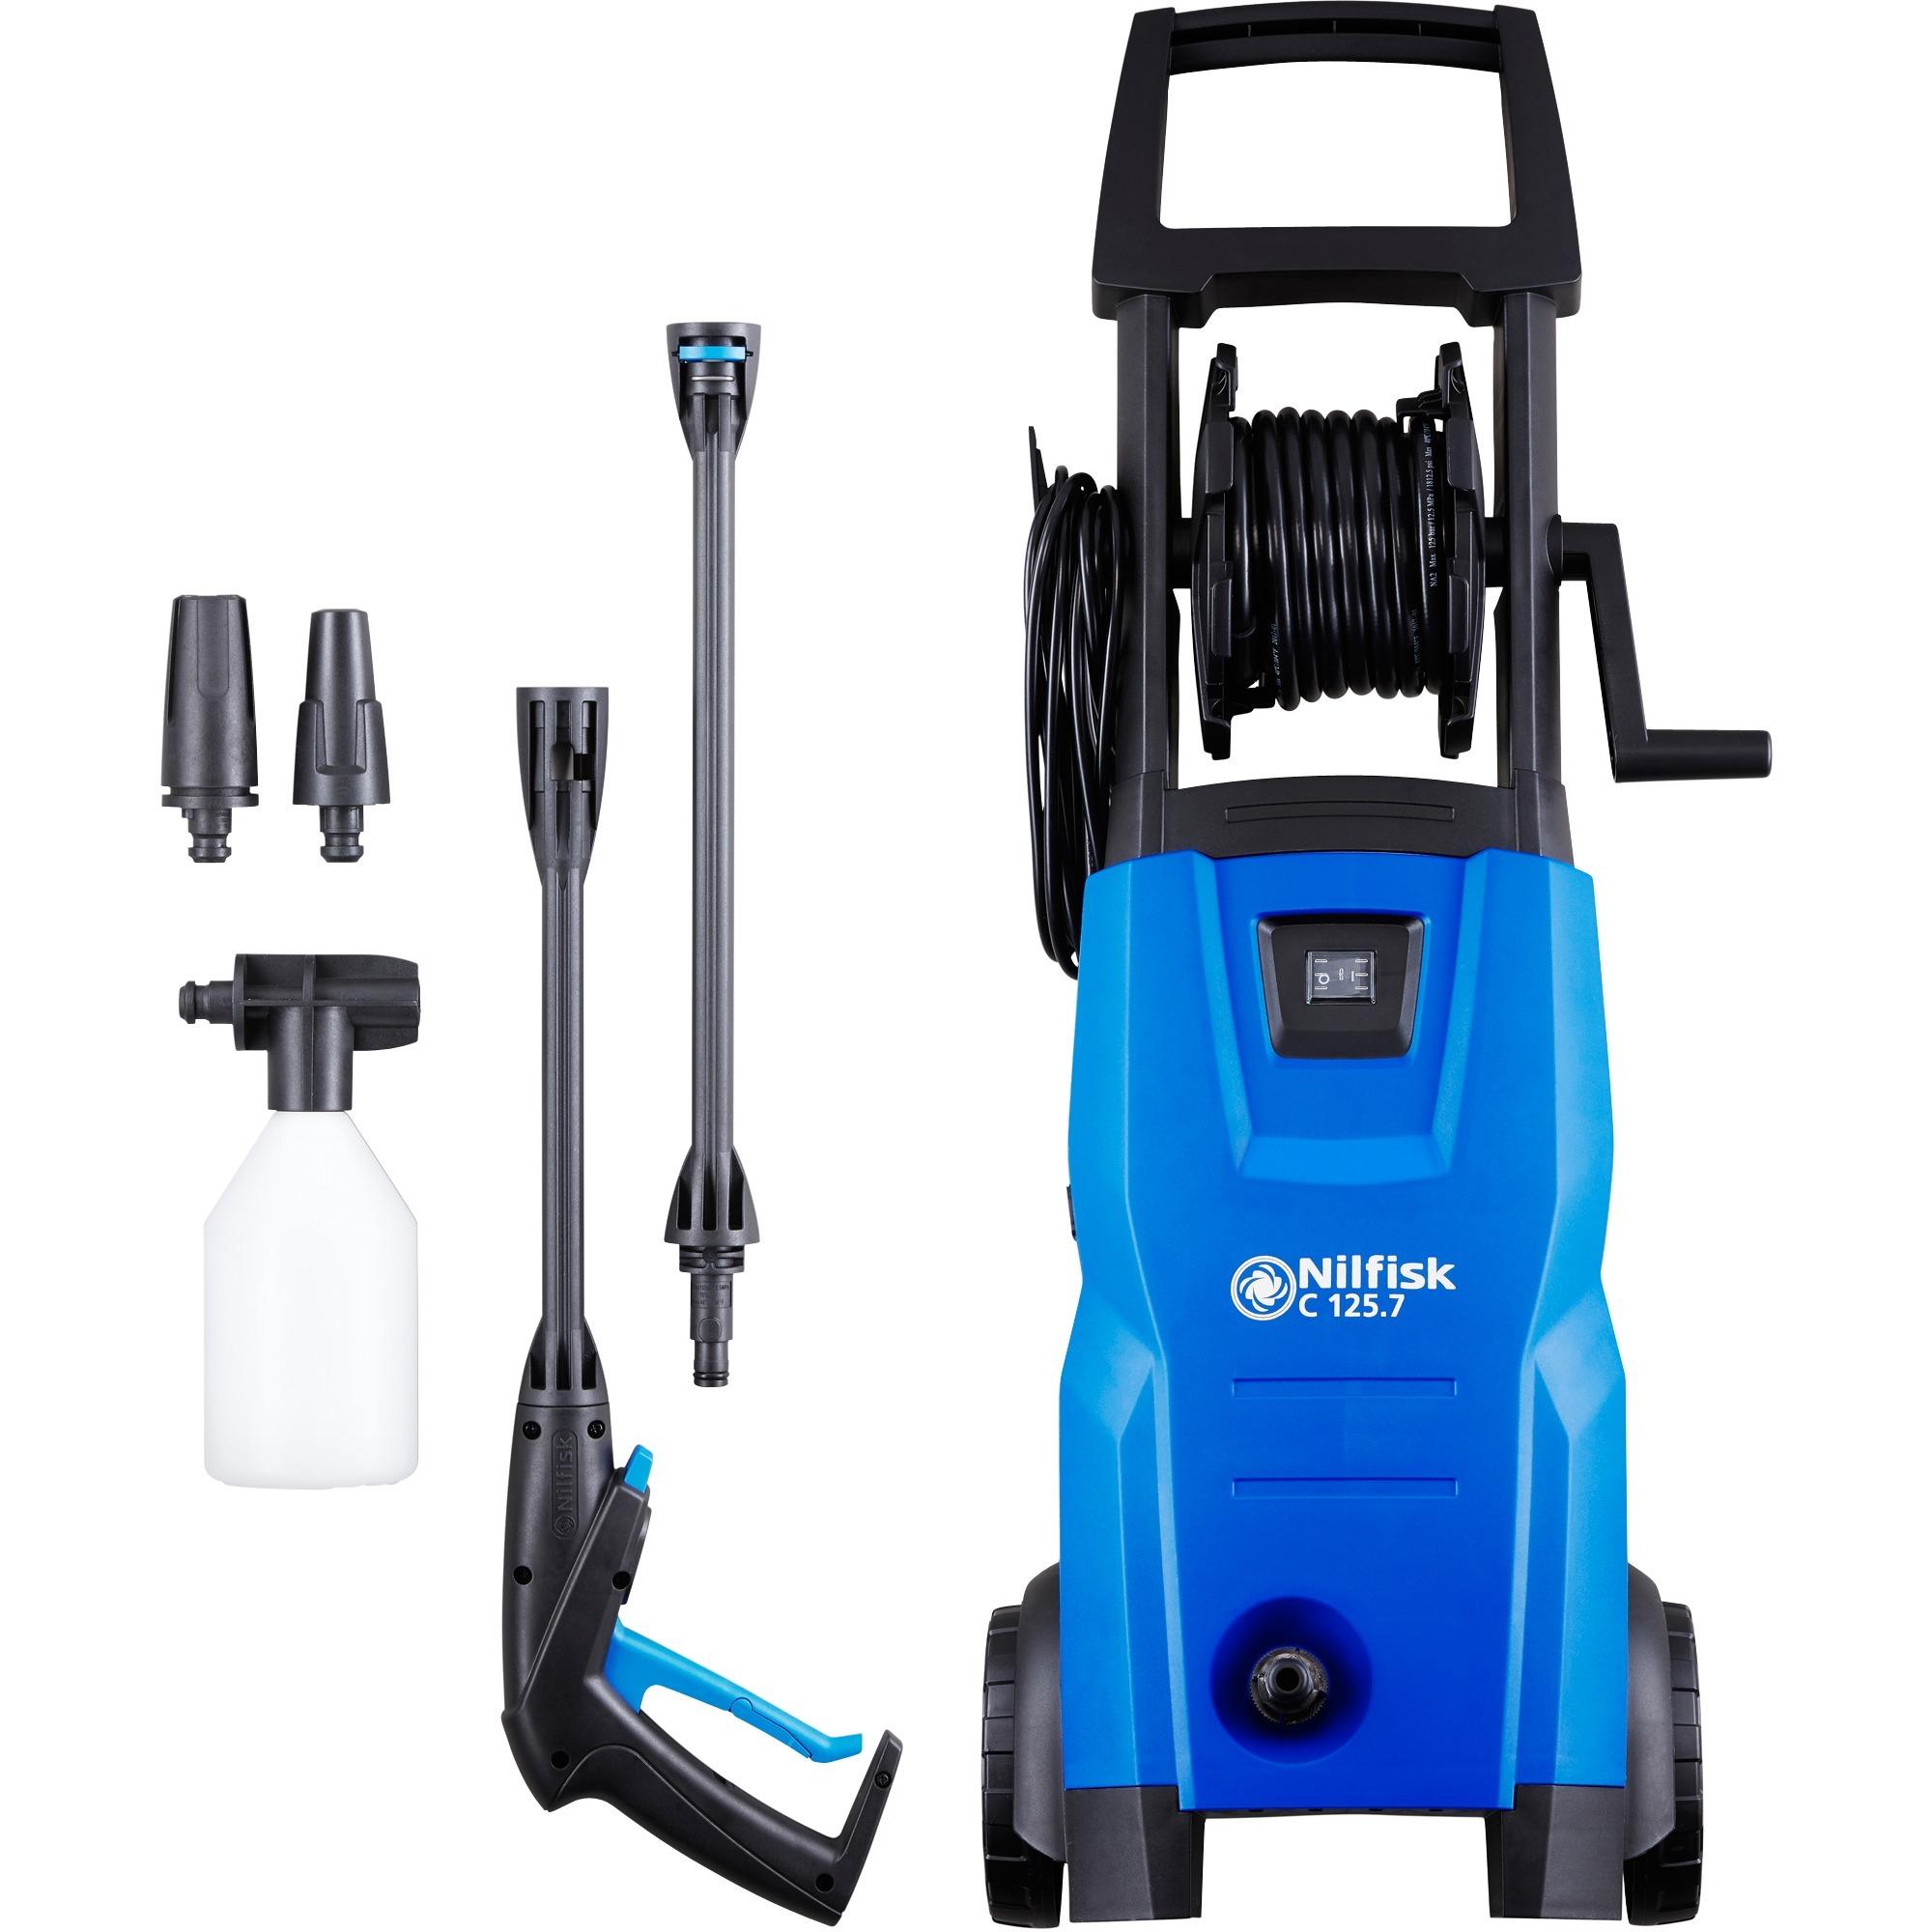 C 125.7 X-TRA EU Vertical Eléctrico 460l/h 1500W Negro, Azul Limpiadora de alta presión o Hidrolimpiadora, Hidrolimpiadora de alta presión